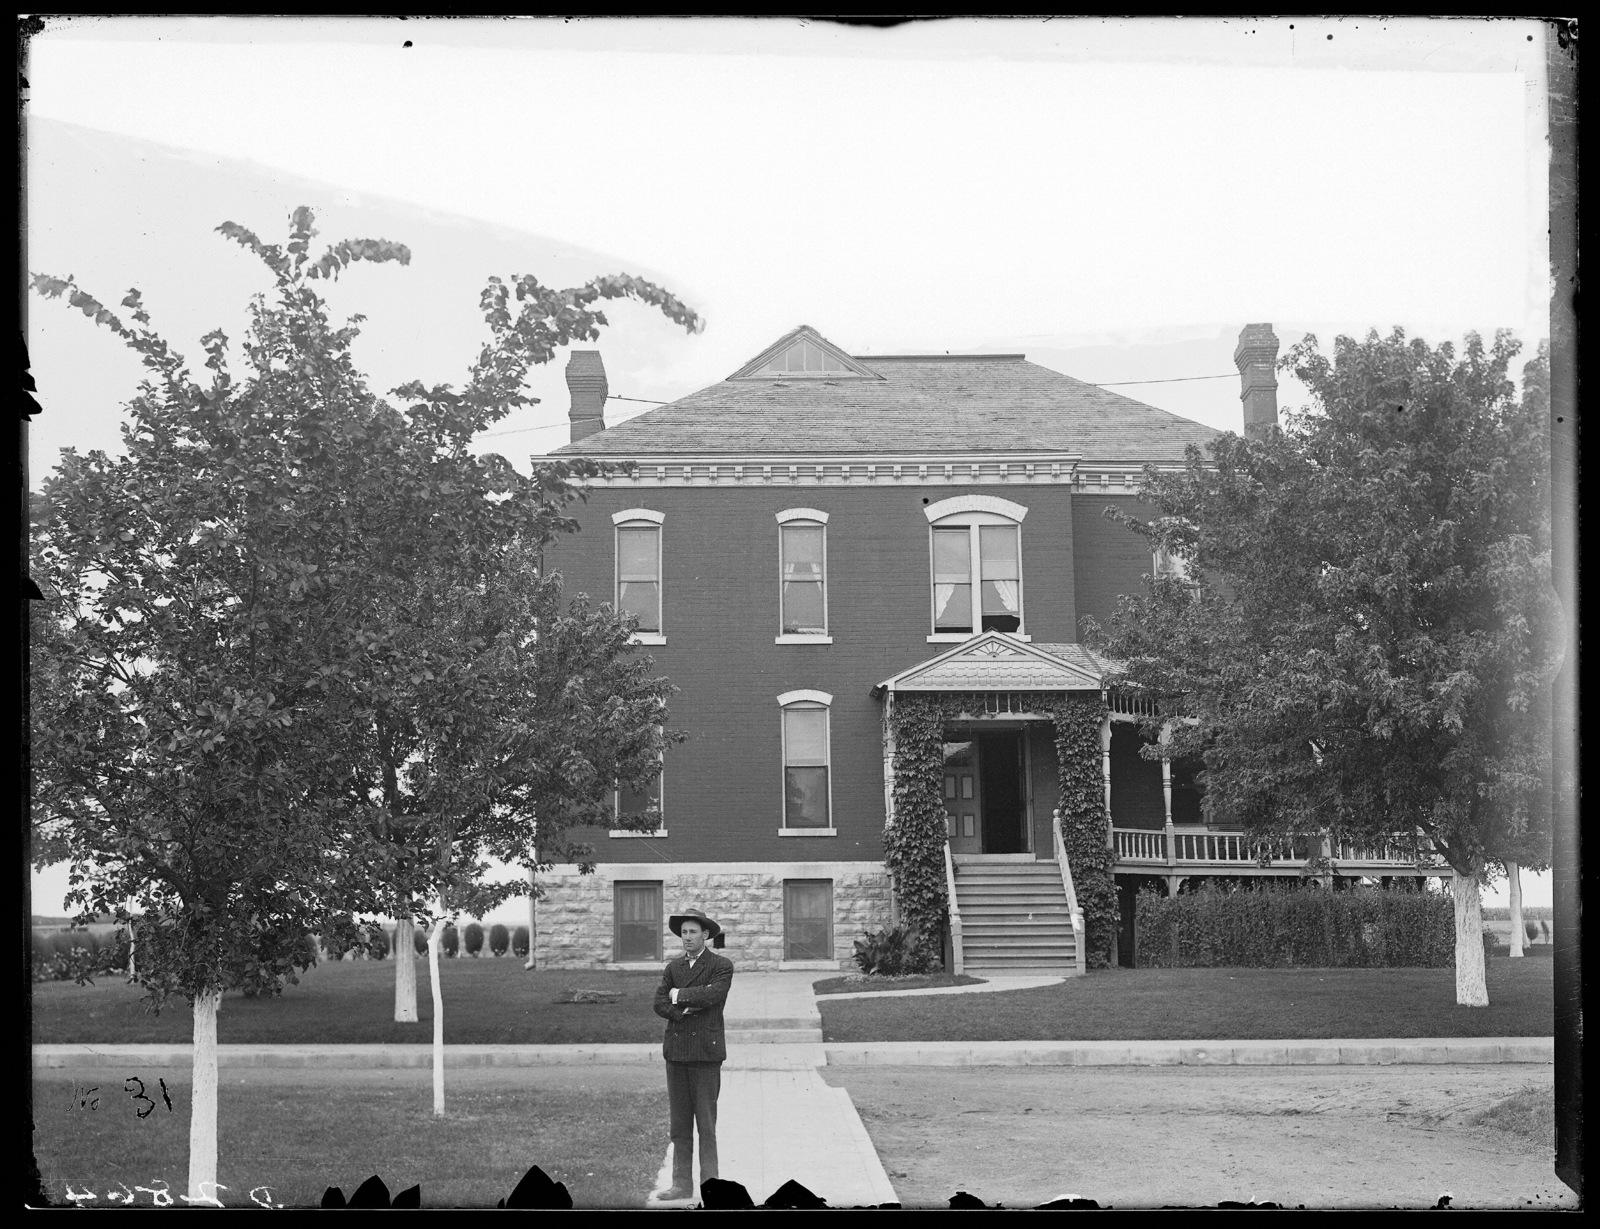 Superintendent Hayward at the State Industrial School for Boys, Kearney, Nebraska.